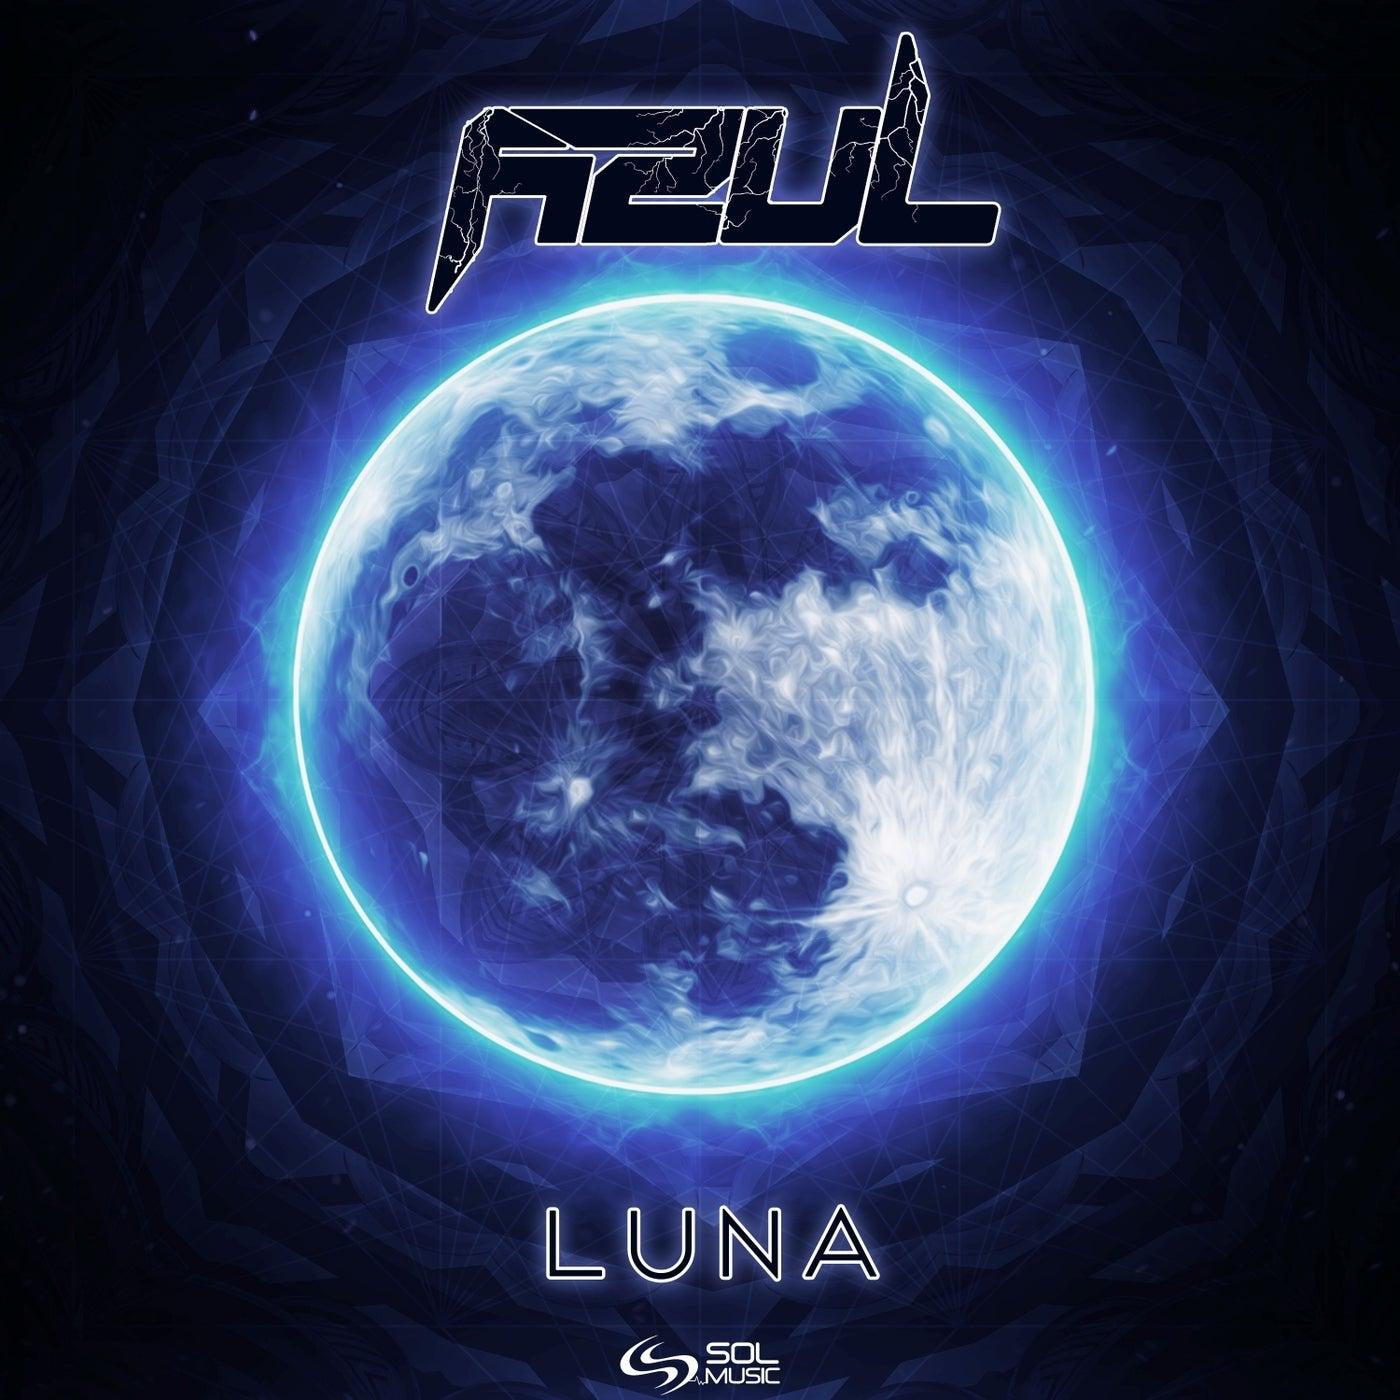 Luna (Original Mix)